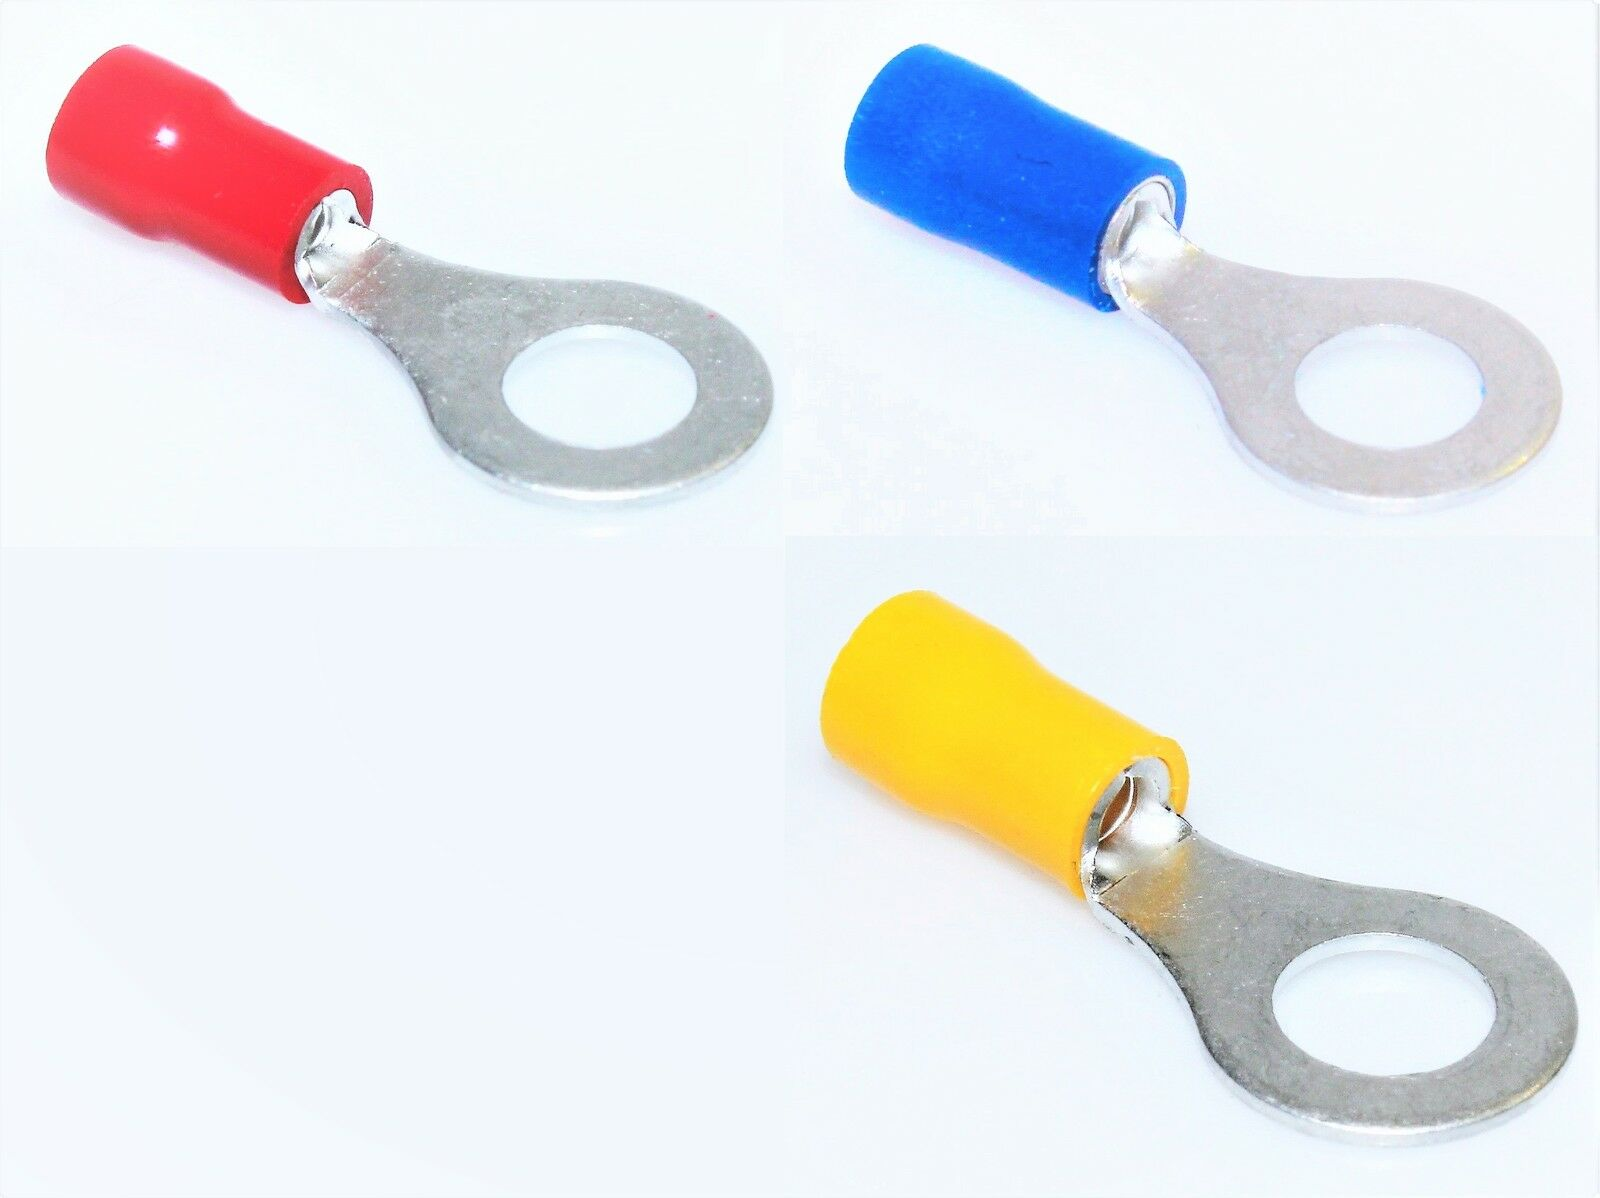 10 Ringösen M5 Ringzunge Ringkabelschuhe Quetschverbinder GELB 6mm²